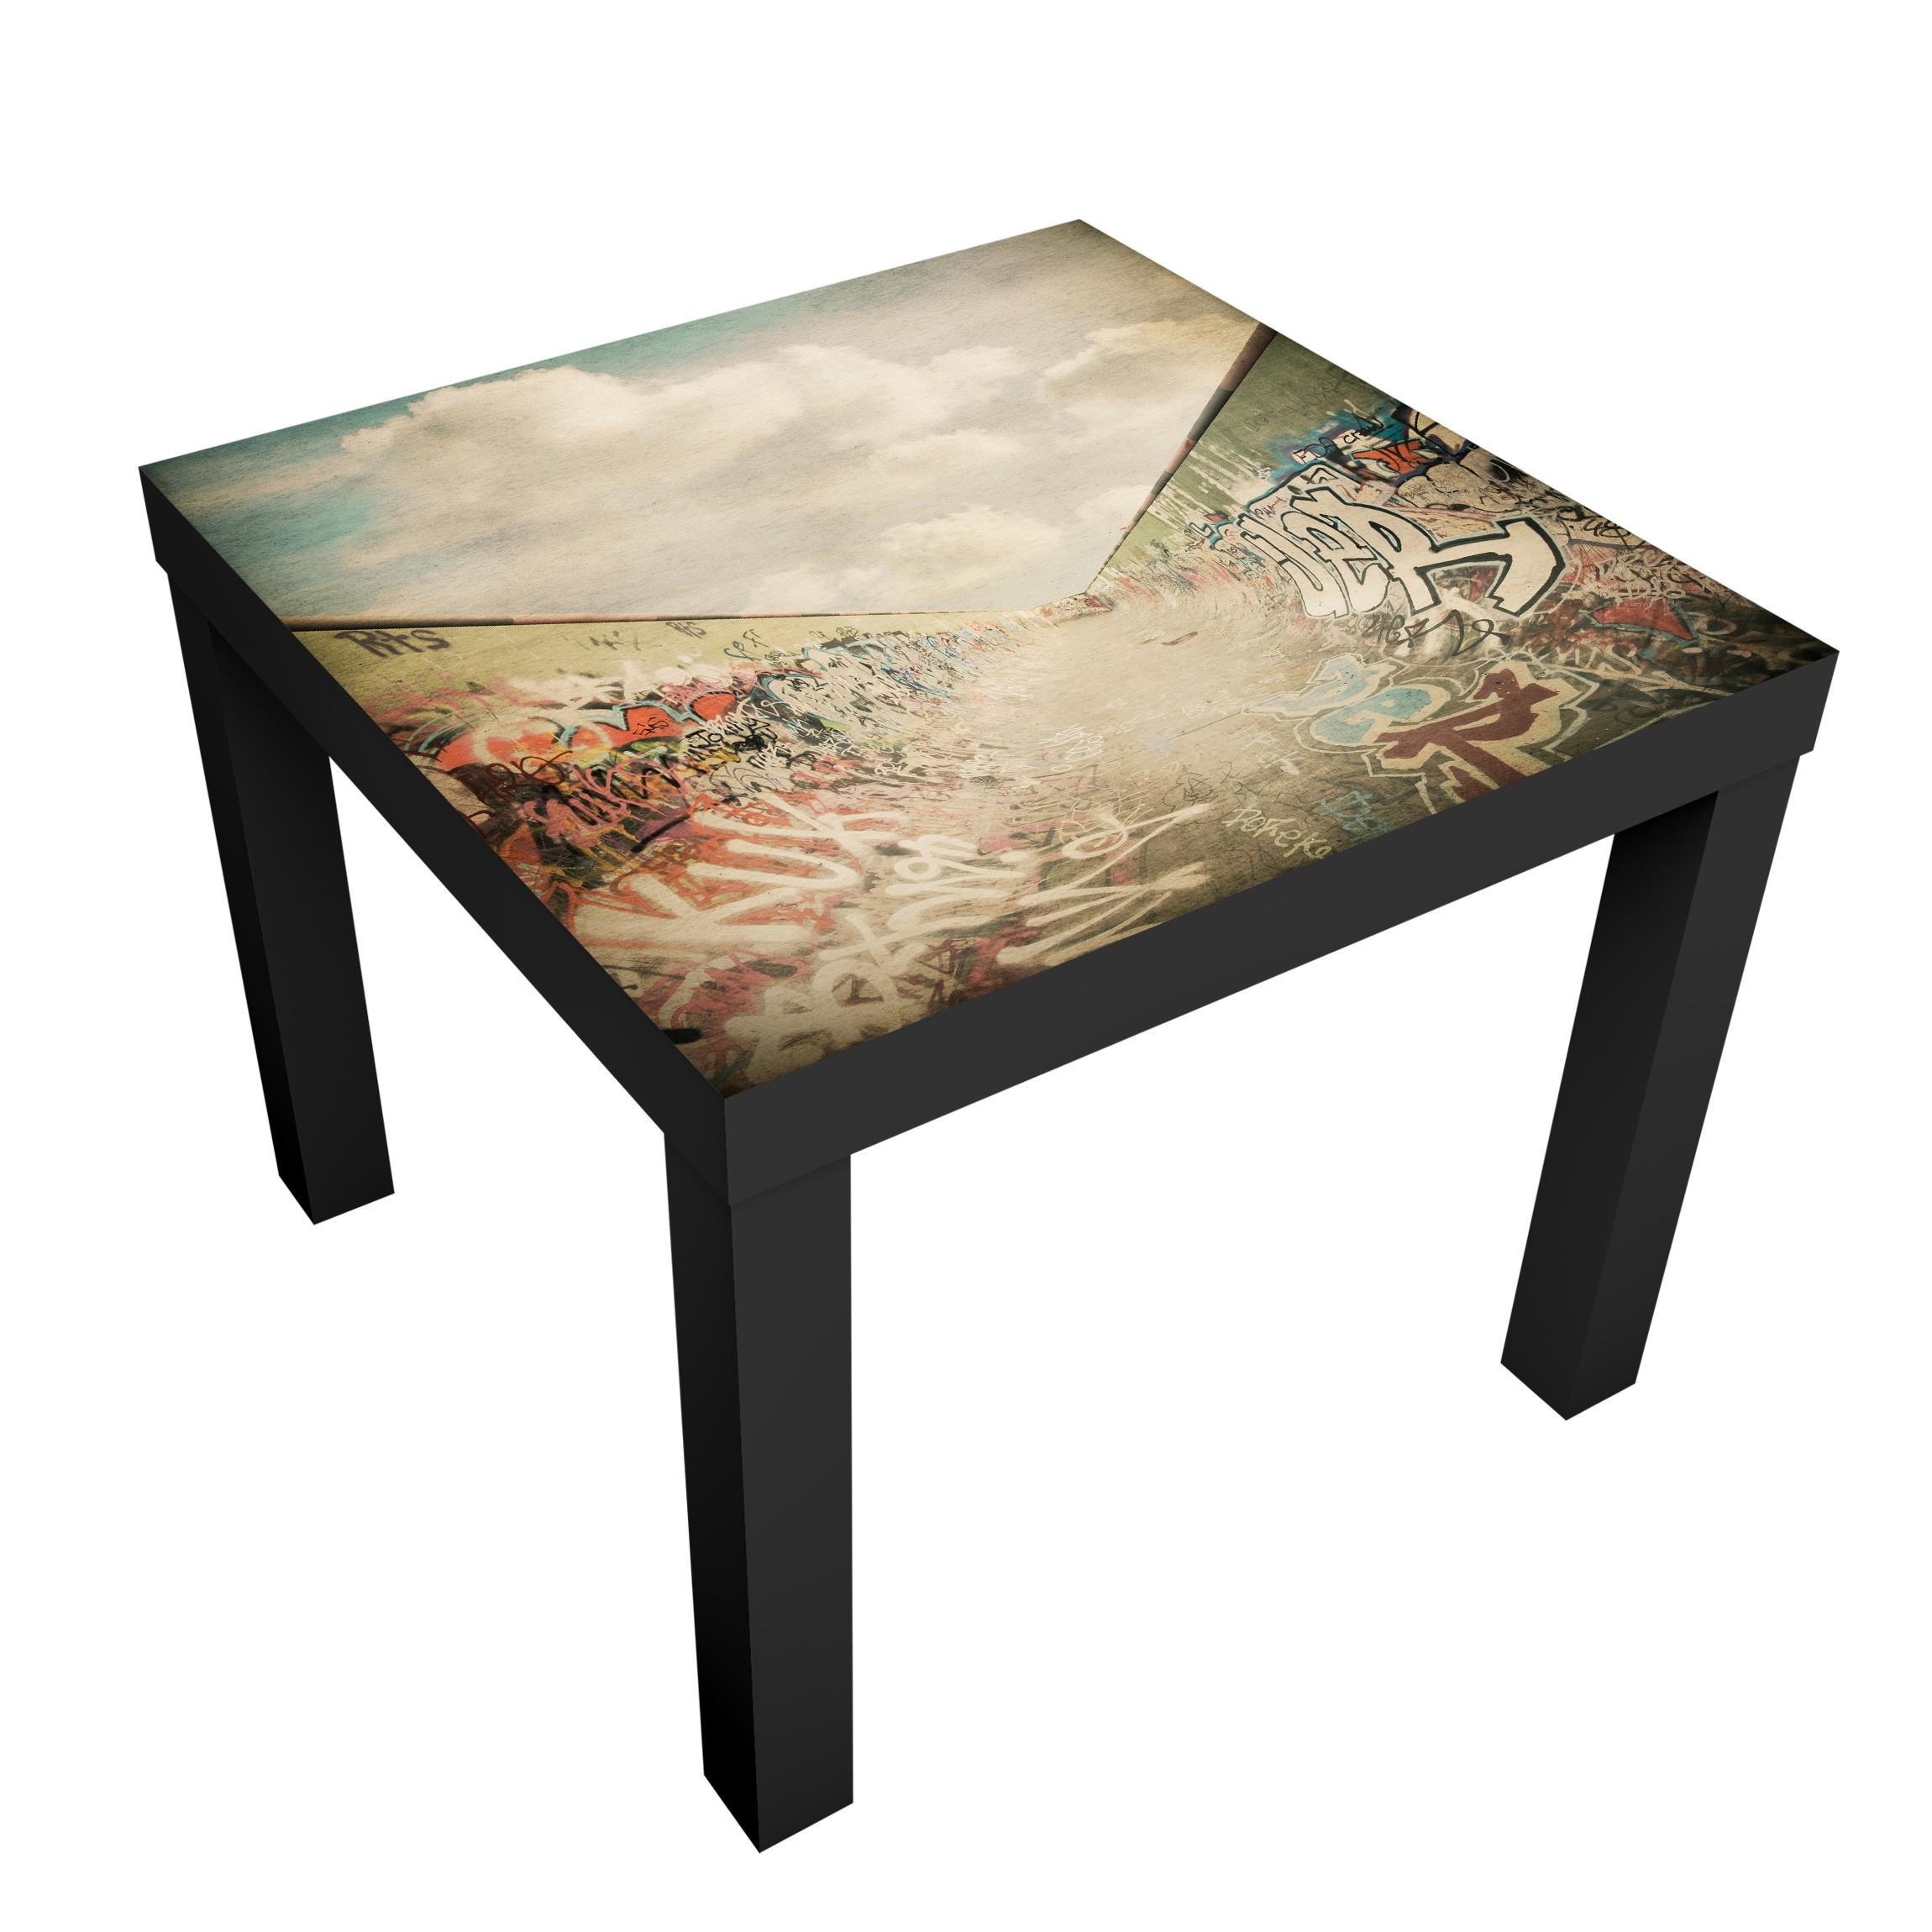 Carta adesiva per mobili ikea lack tavolino graffiti skate park - Ikea lack tavolino ...